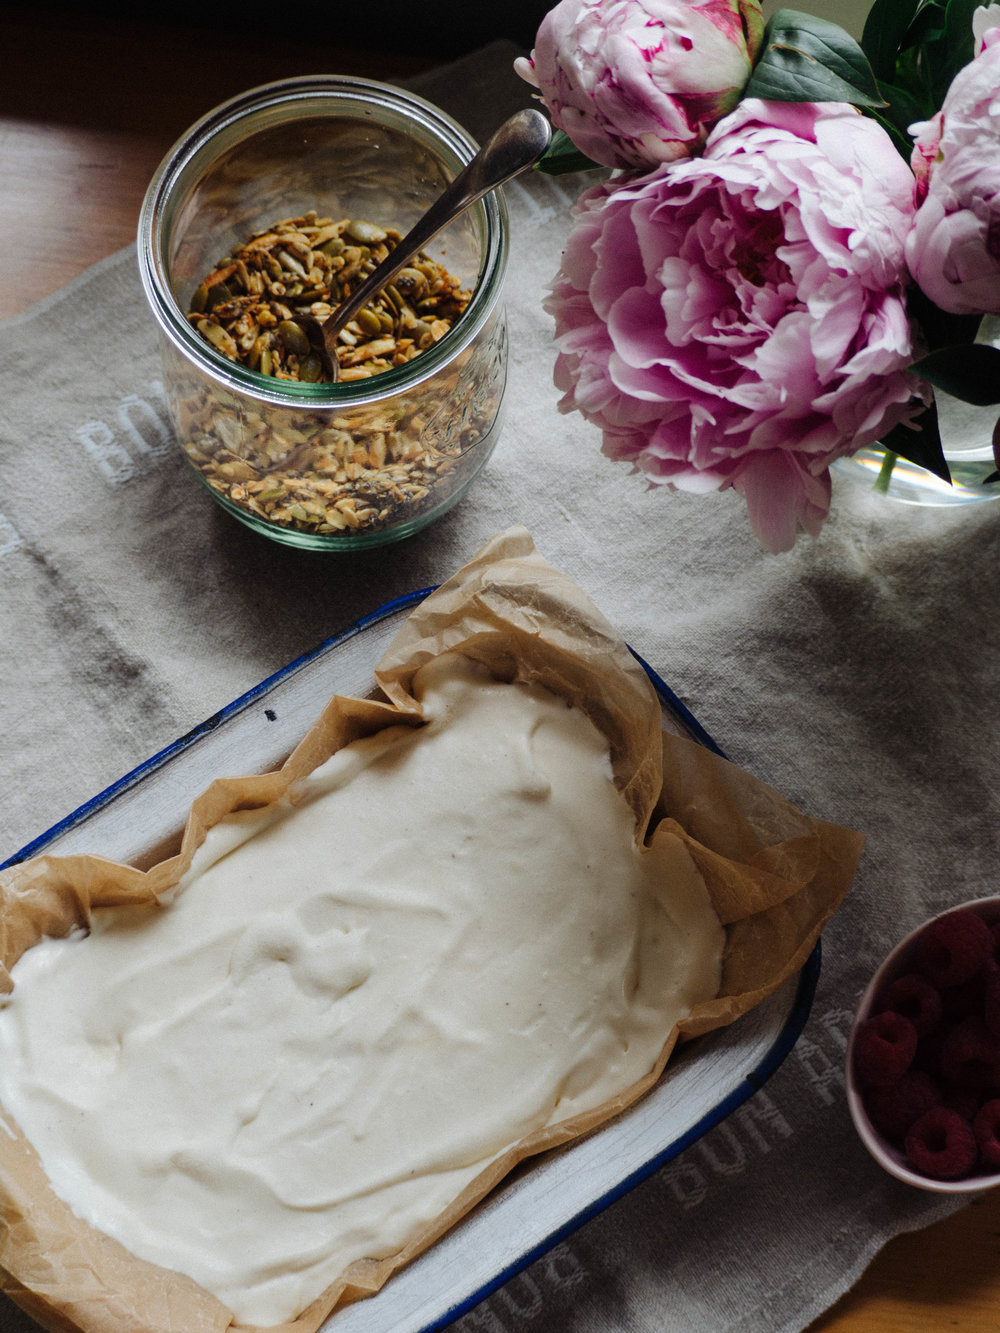 Honey Ice Cream made using Little Big Dairy Co Honey Malt and Vanilla Milk